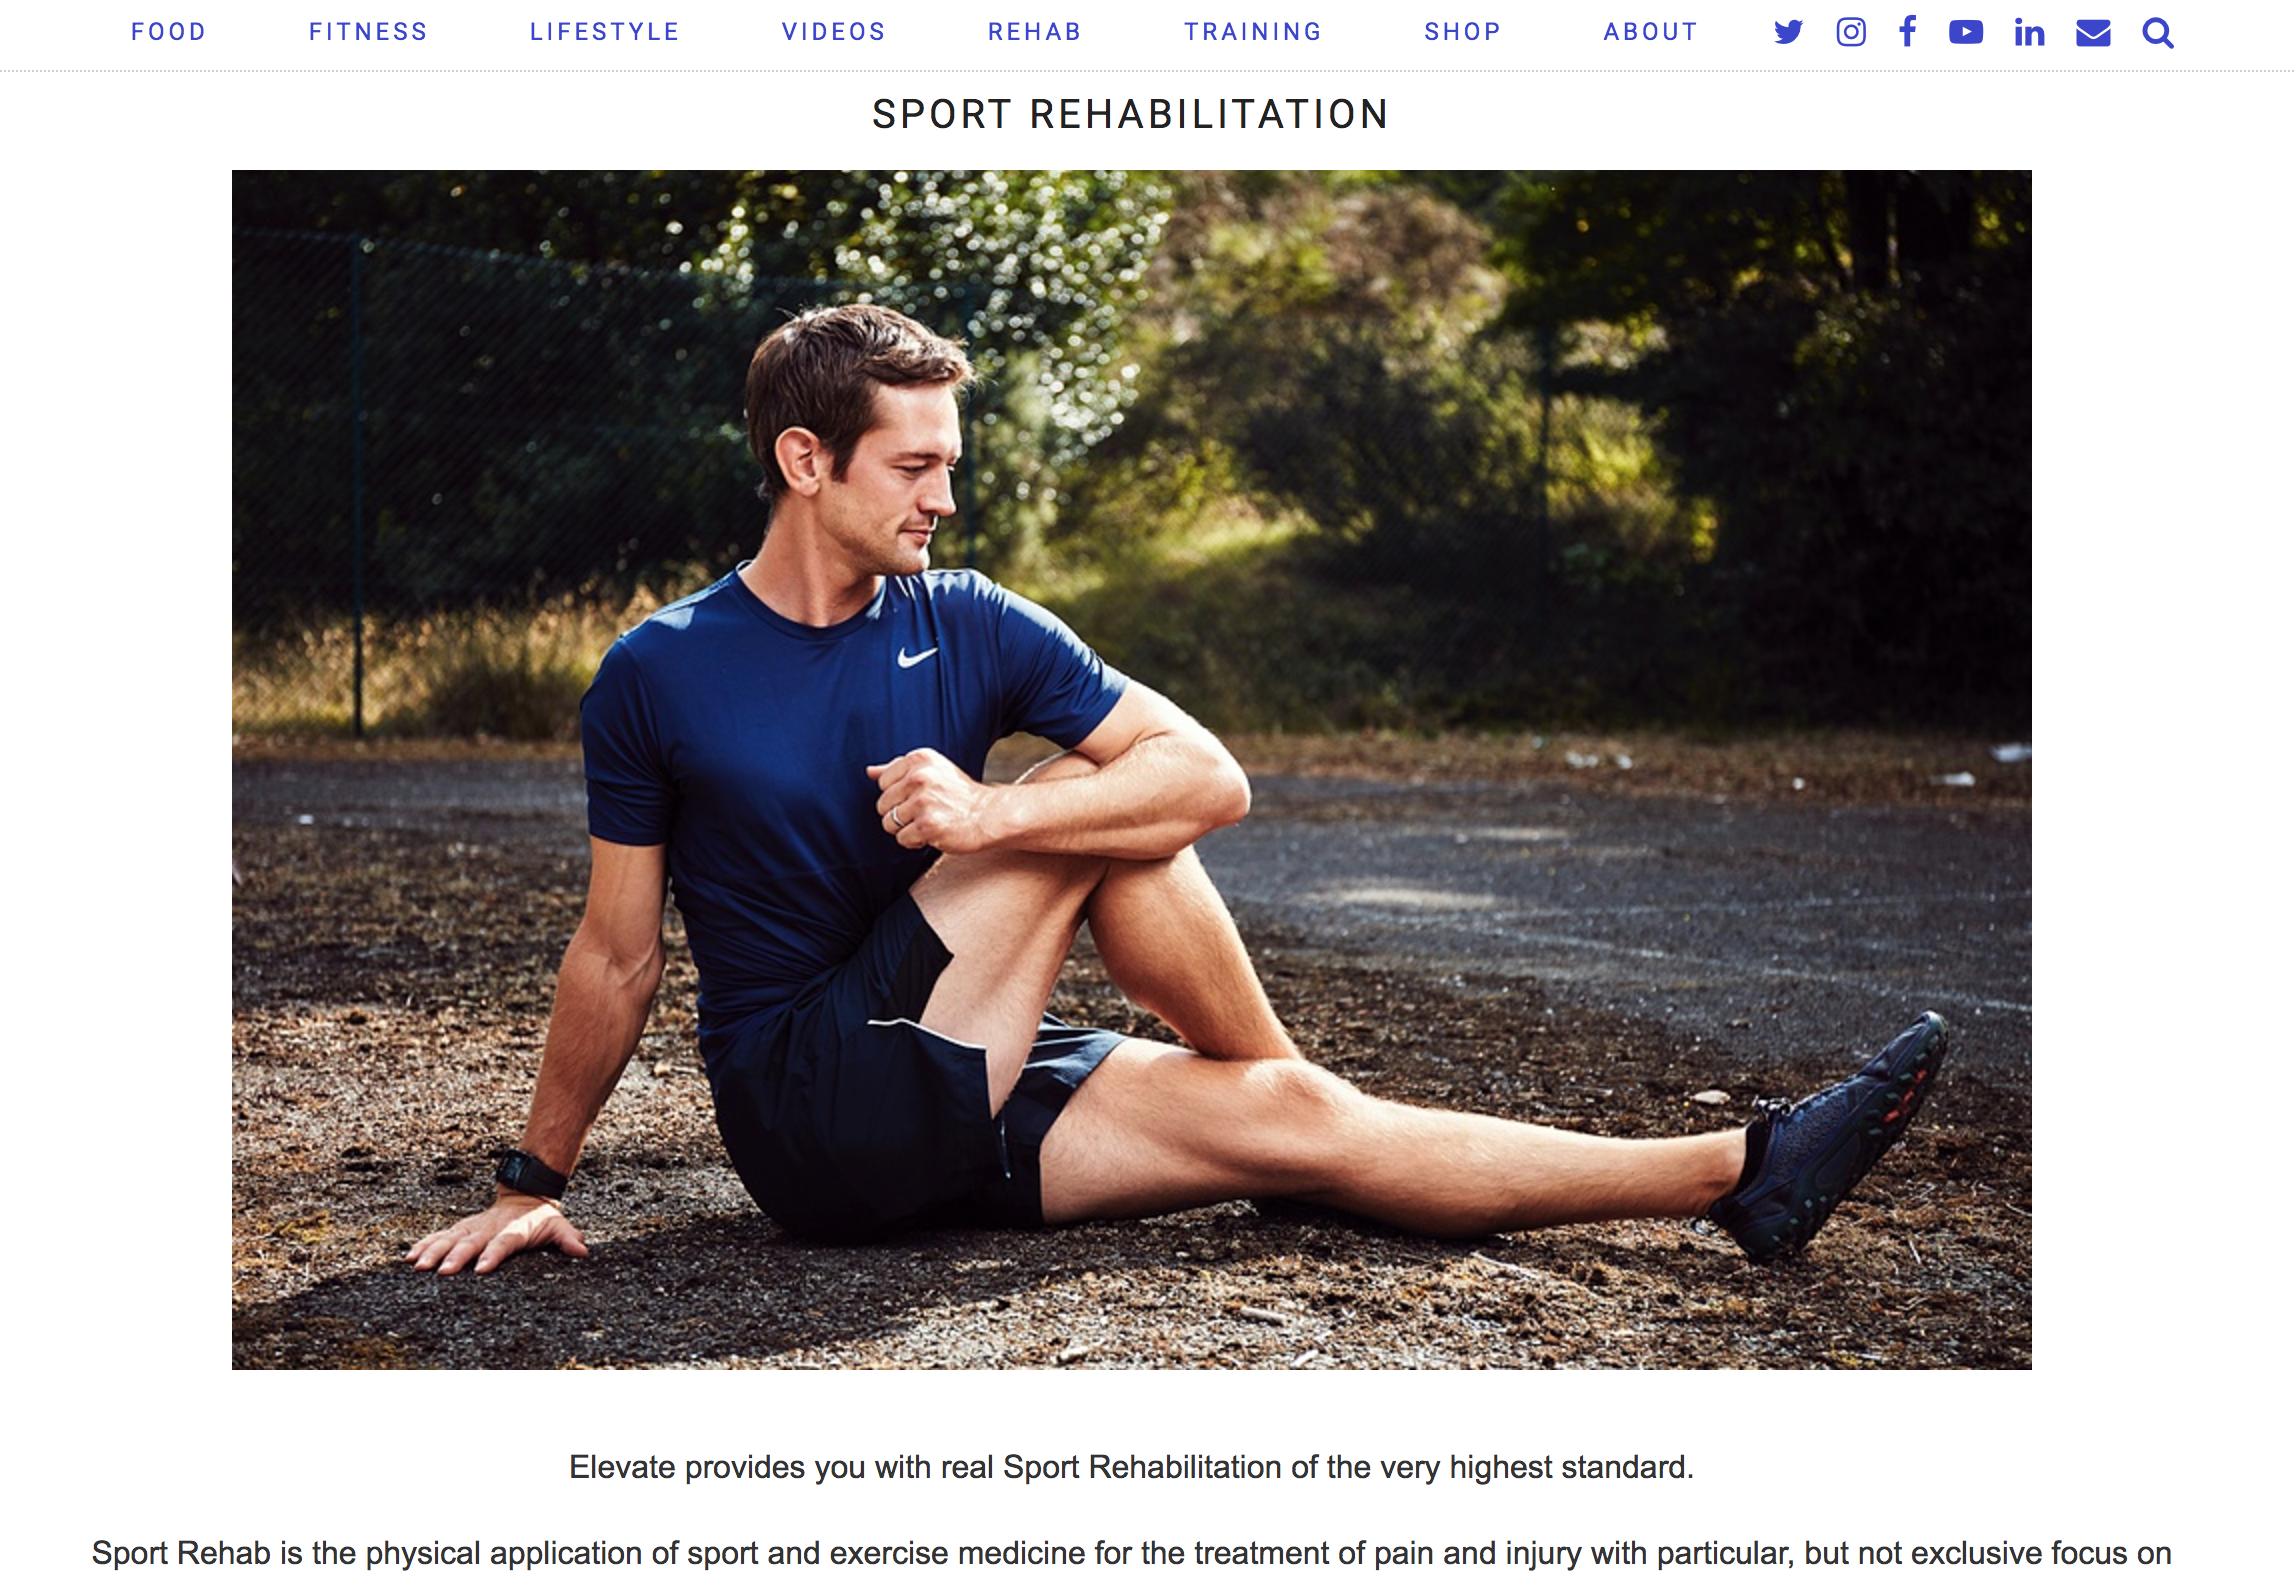 www.elevatesport.co.uk/sport-rehab/